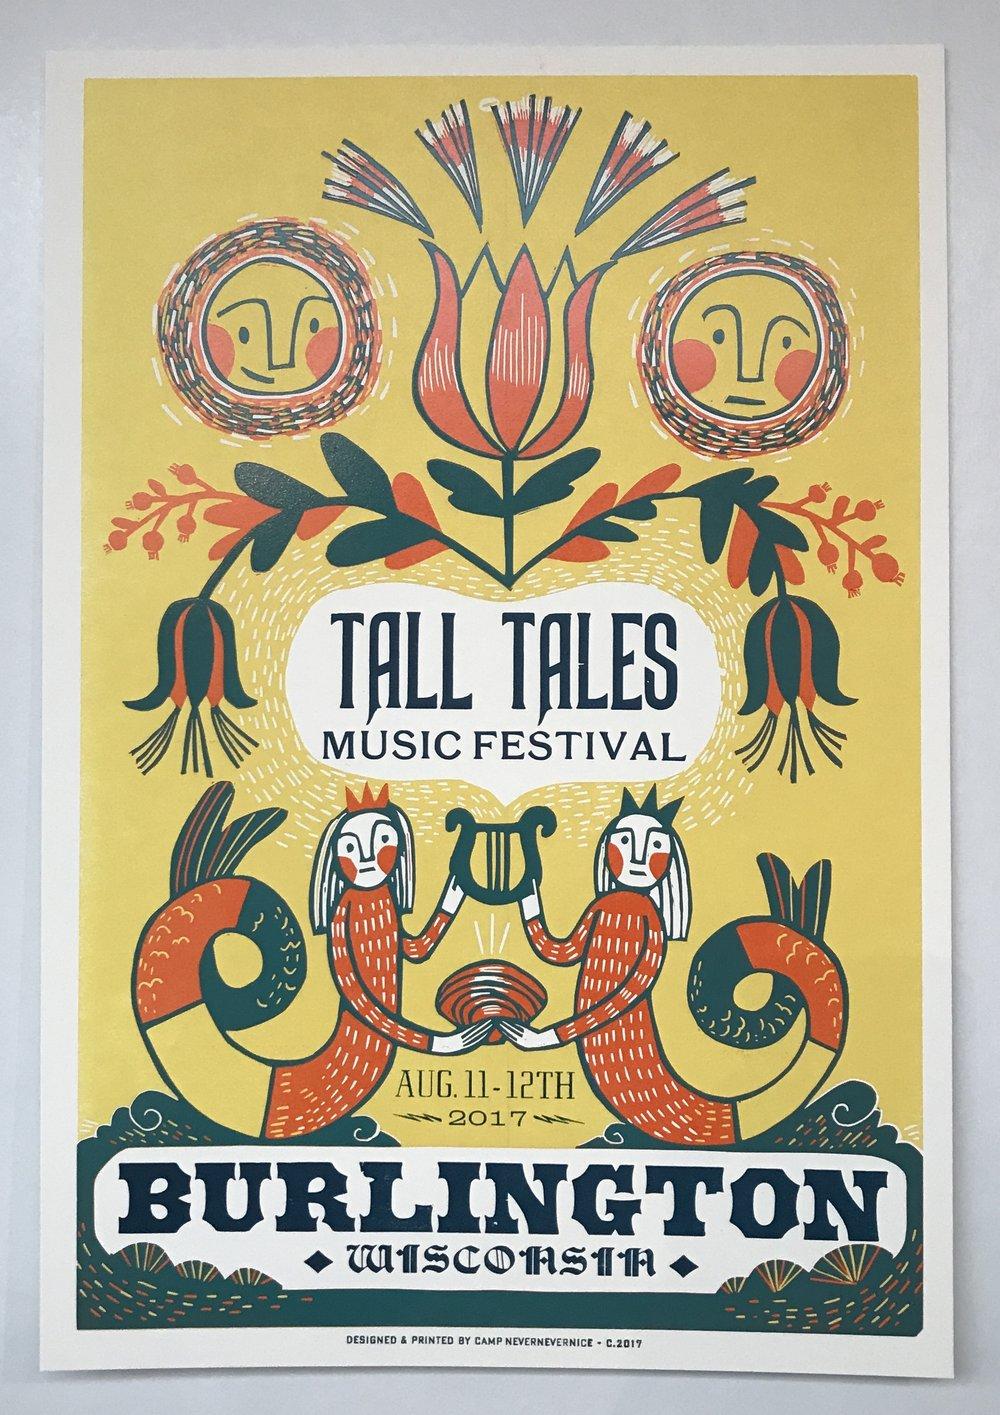 talltalesmusicfestivalburlingtonwi